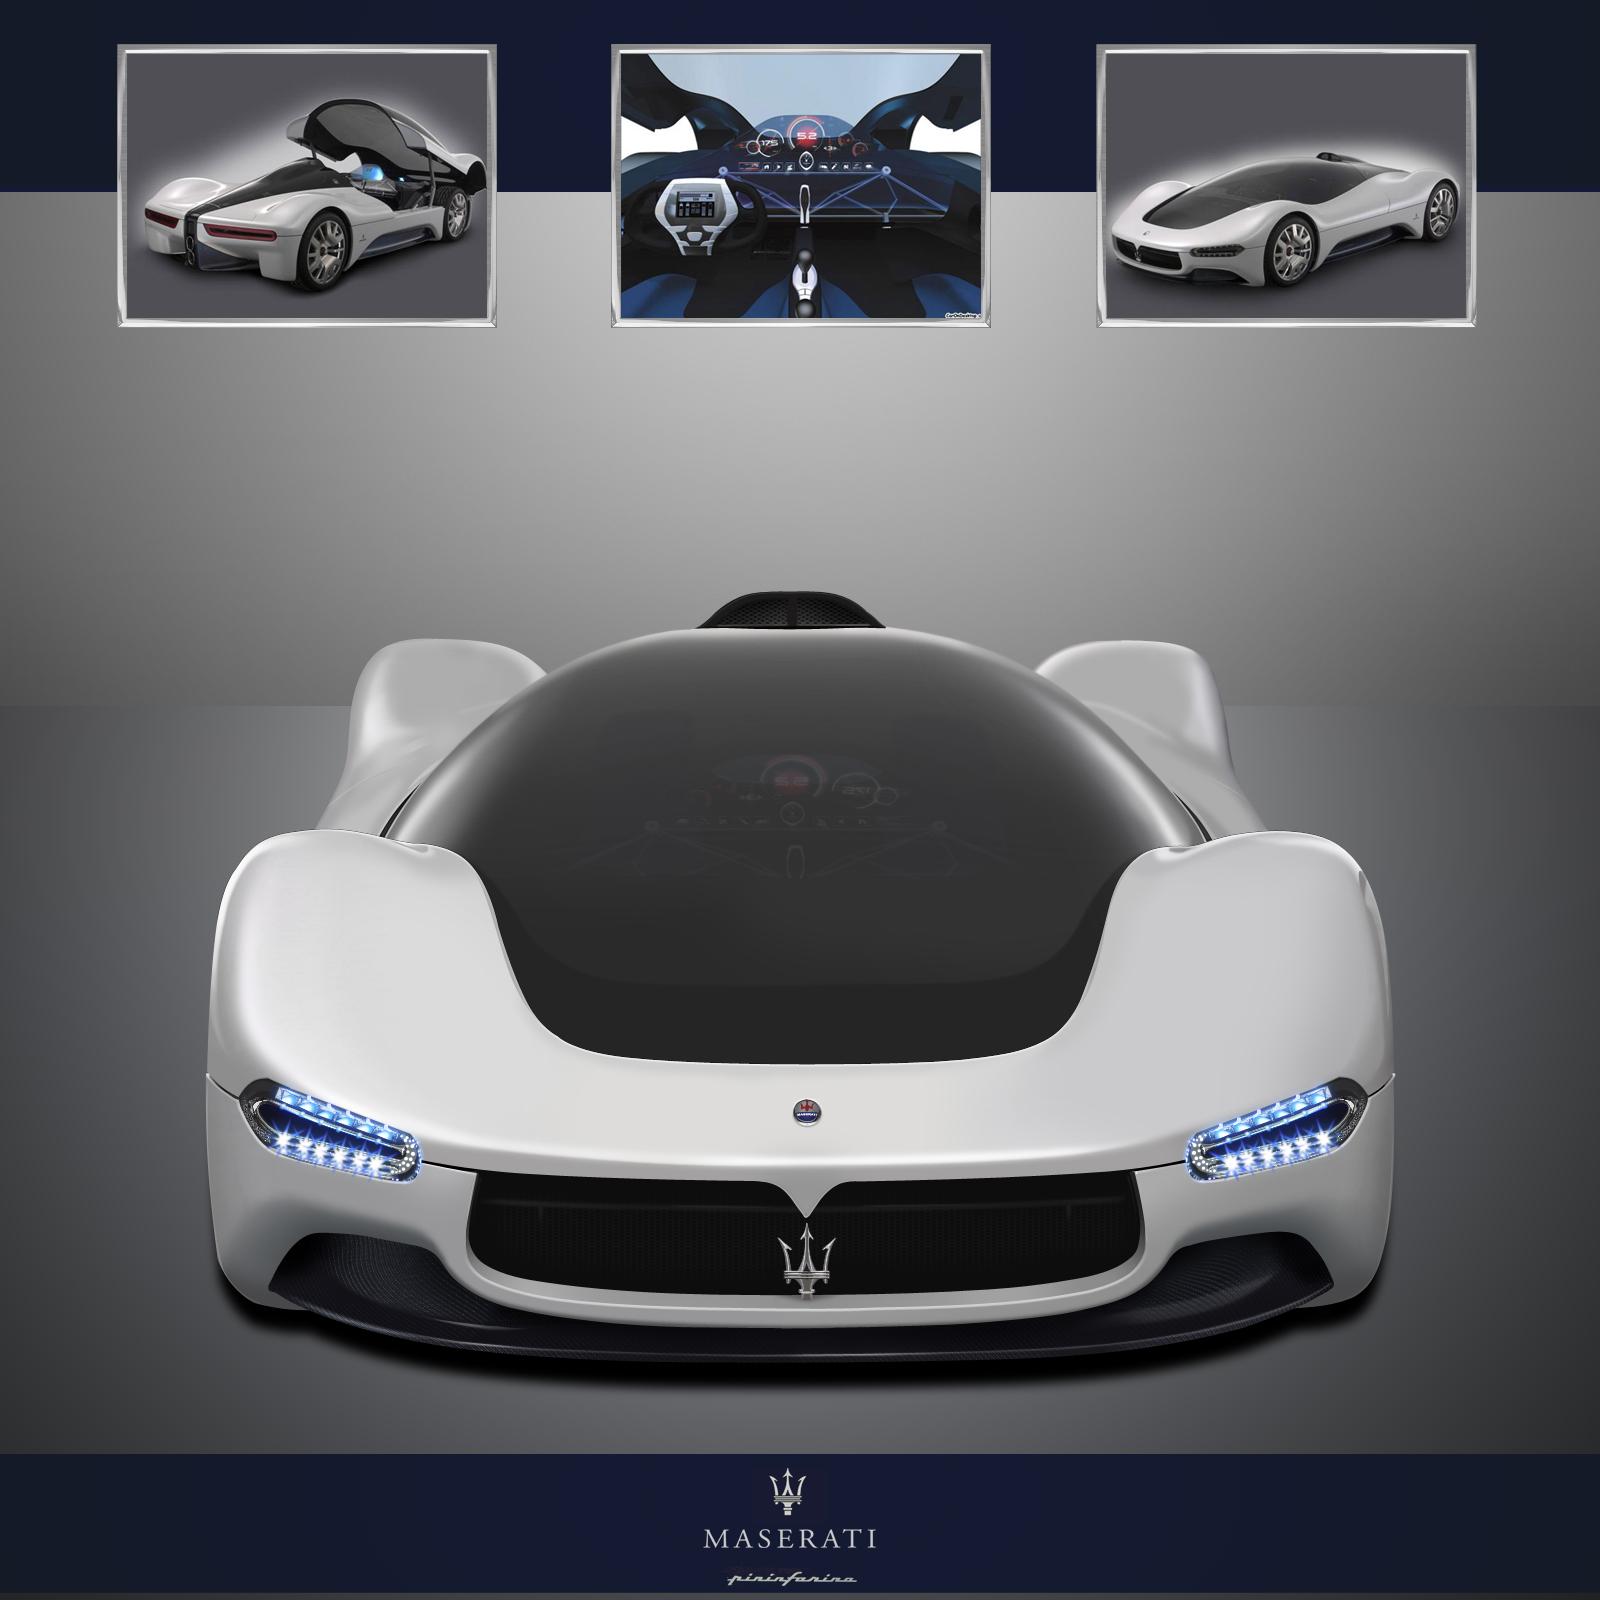 Fastest Ferrari: Fastest Cars: Maserati Birdcage Fastest Cars